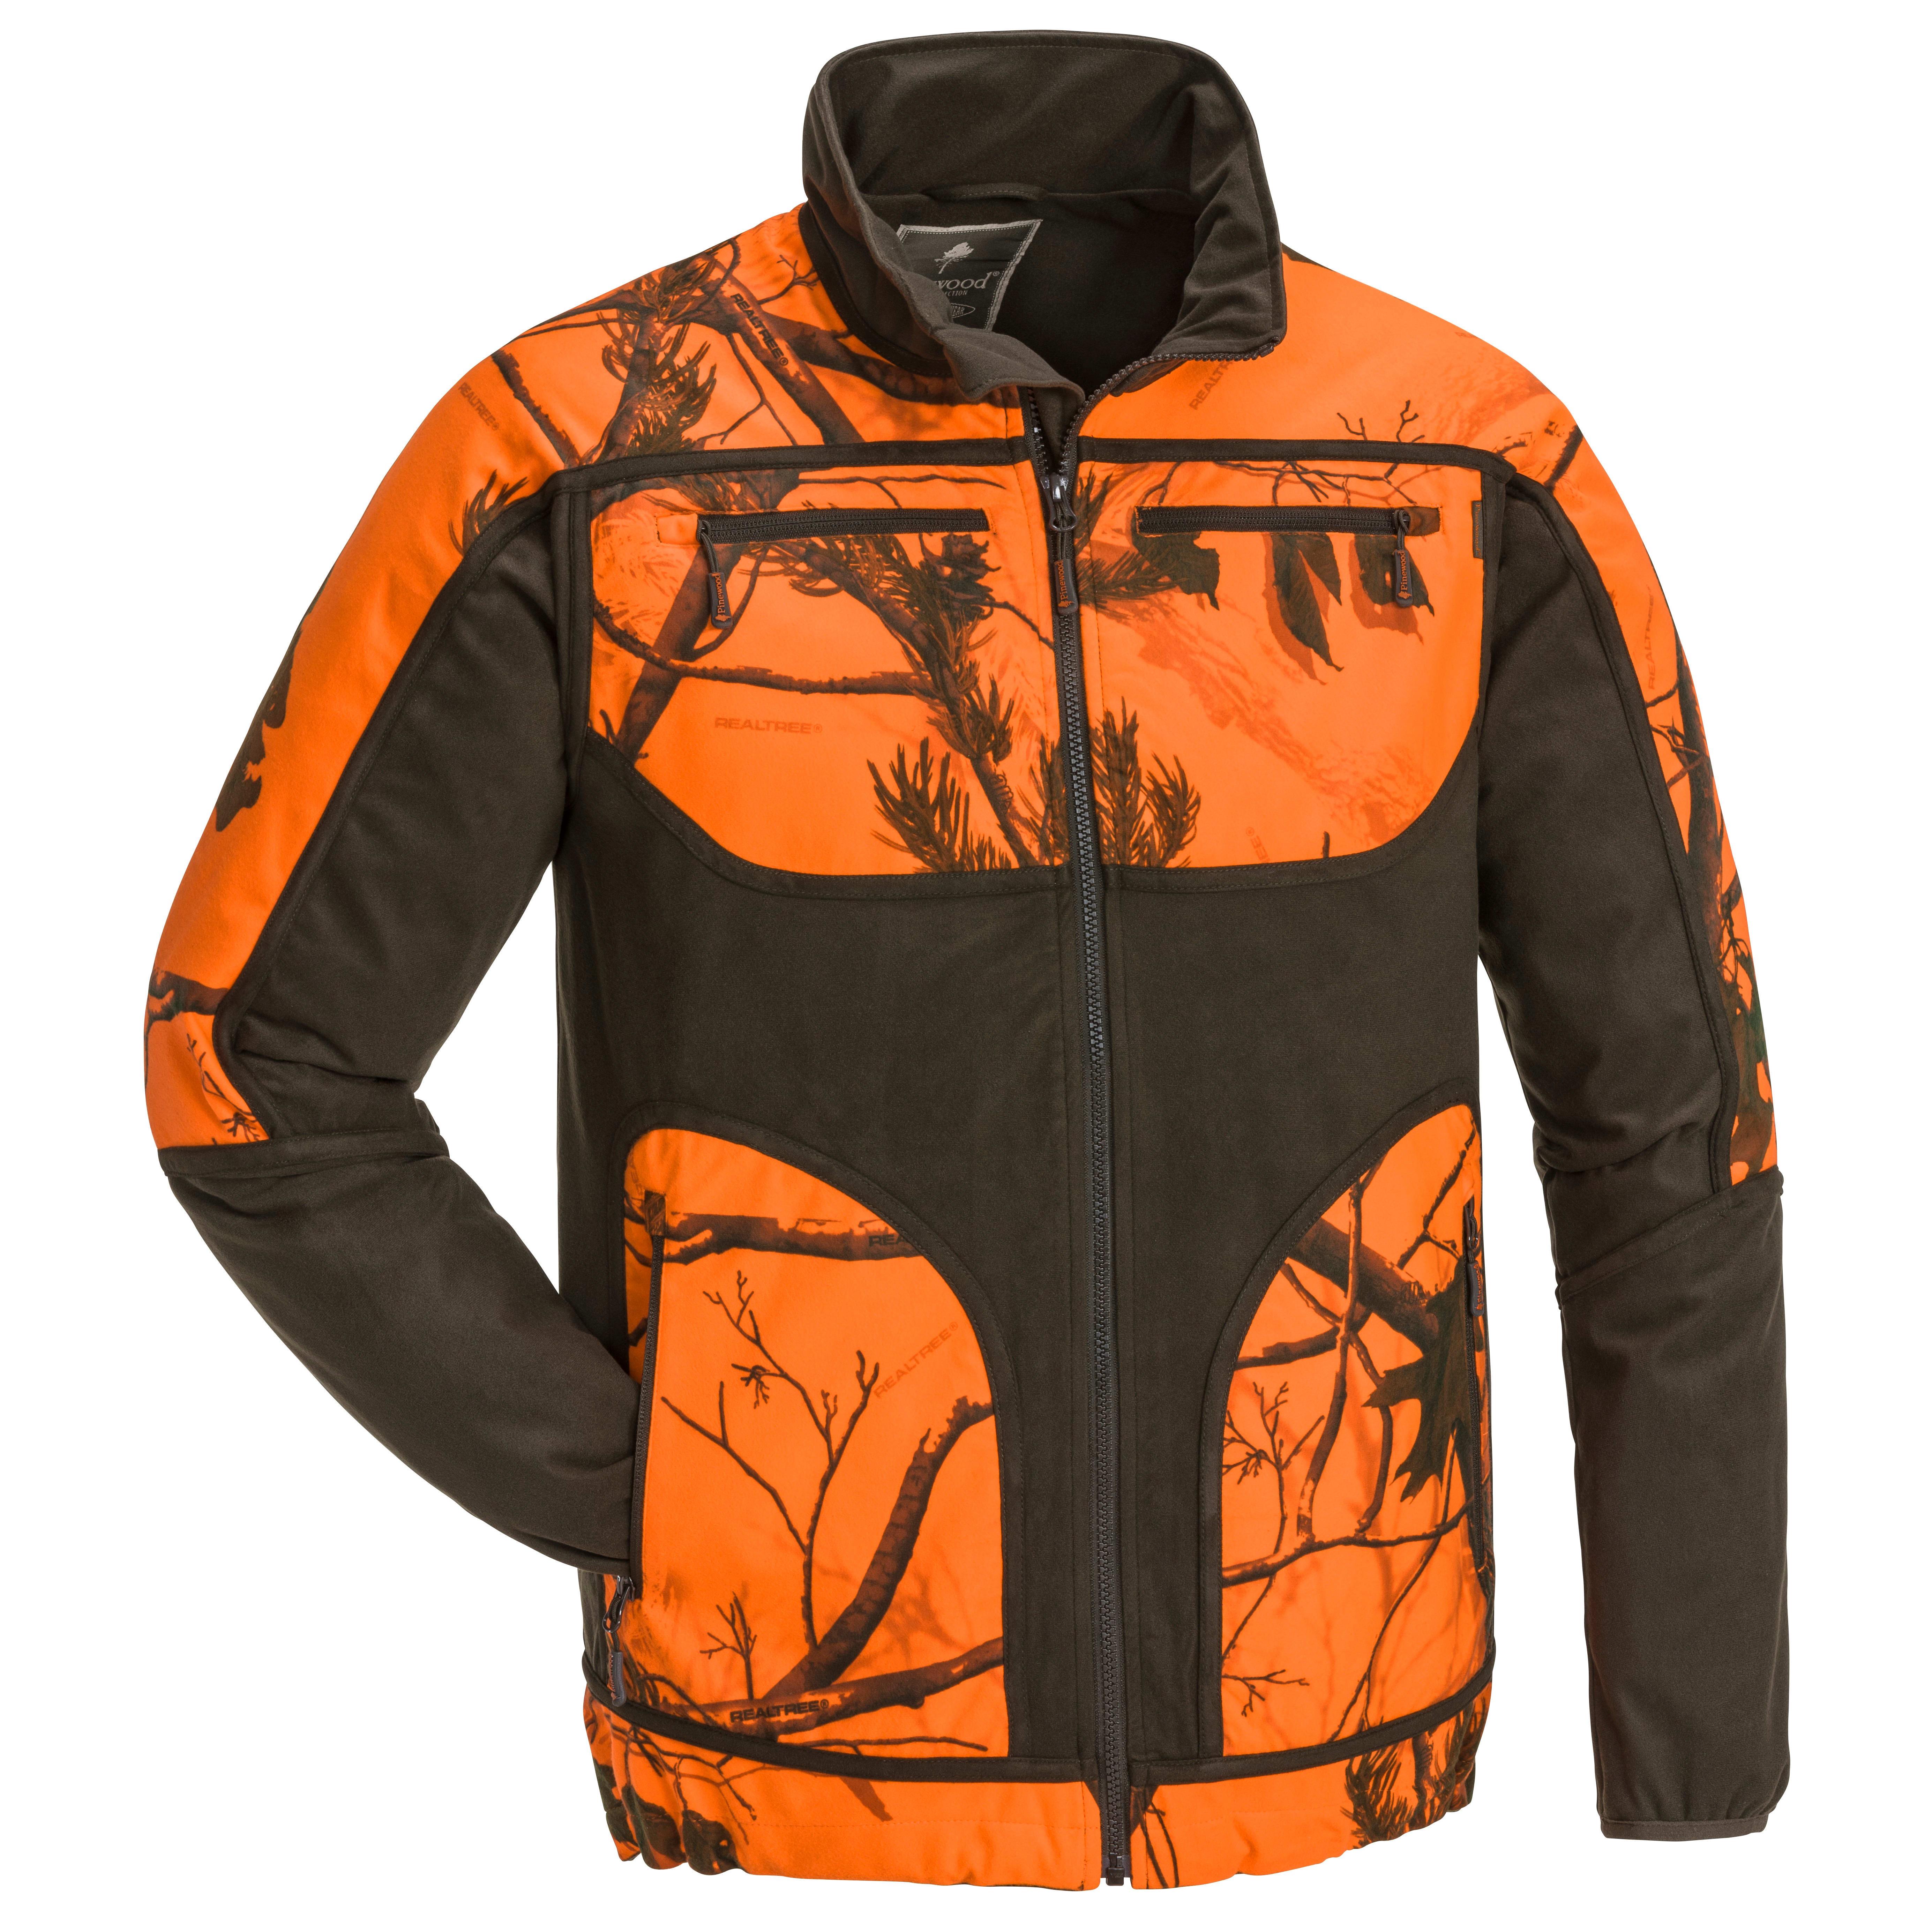 57ea3ba4 Kjøp Jacket Camou Men's Light fra Michigan Outnorth Pinewood WURZf